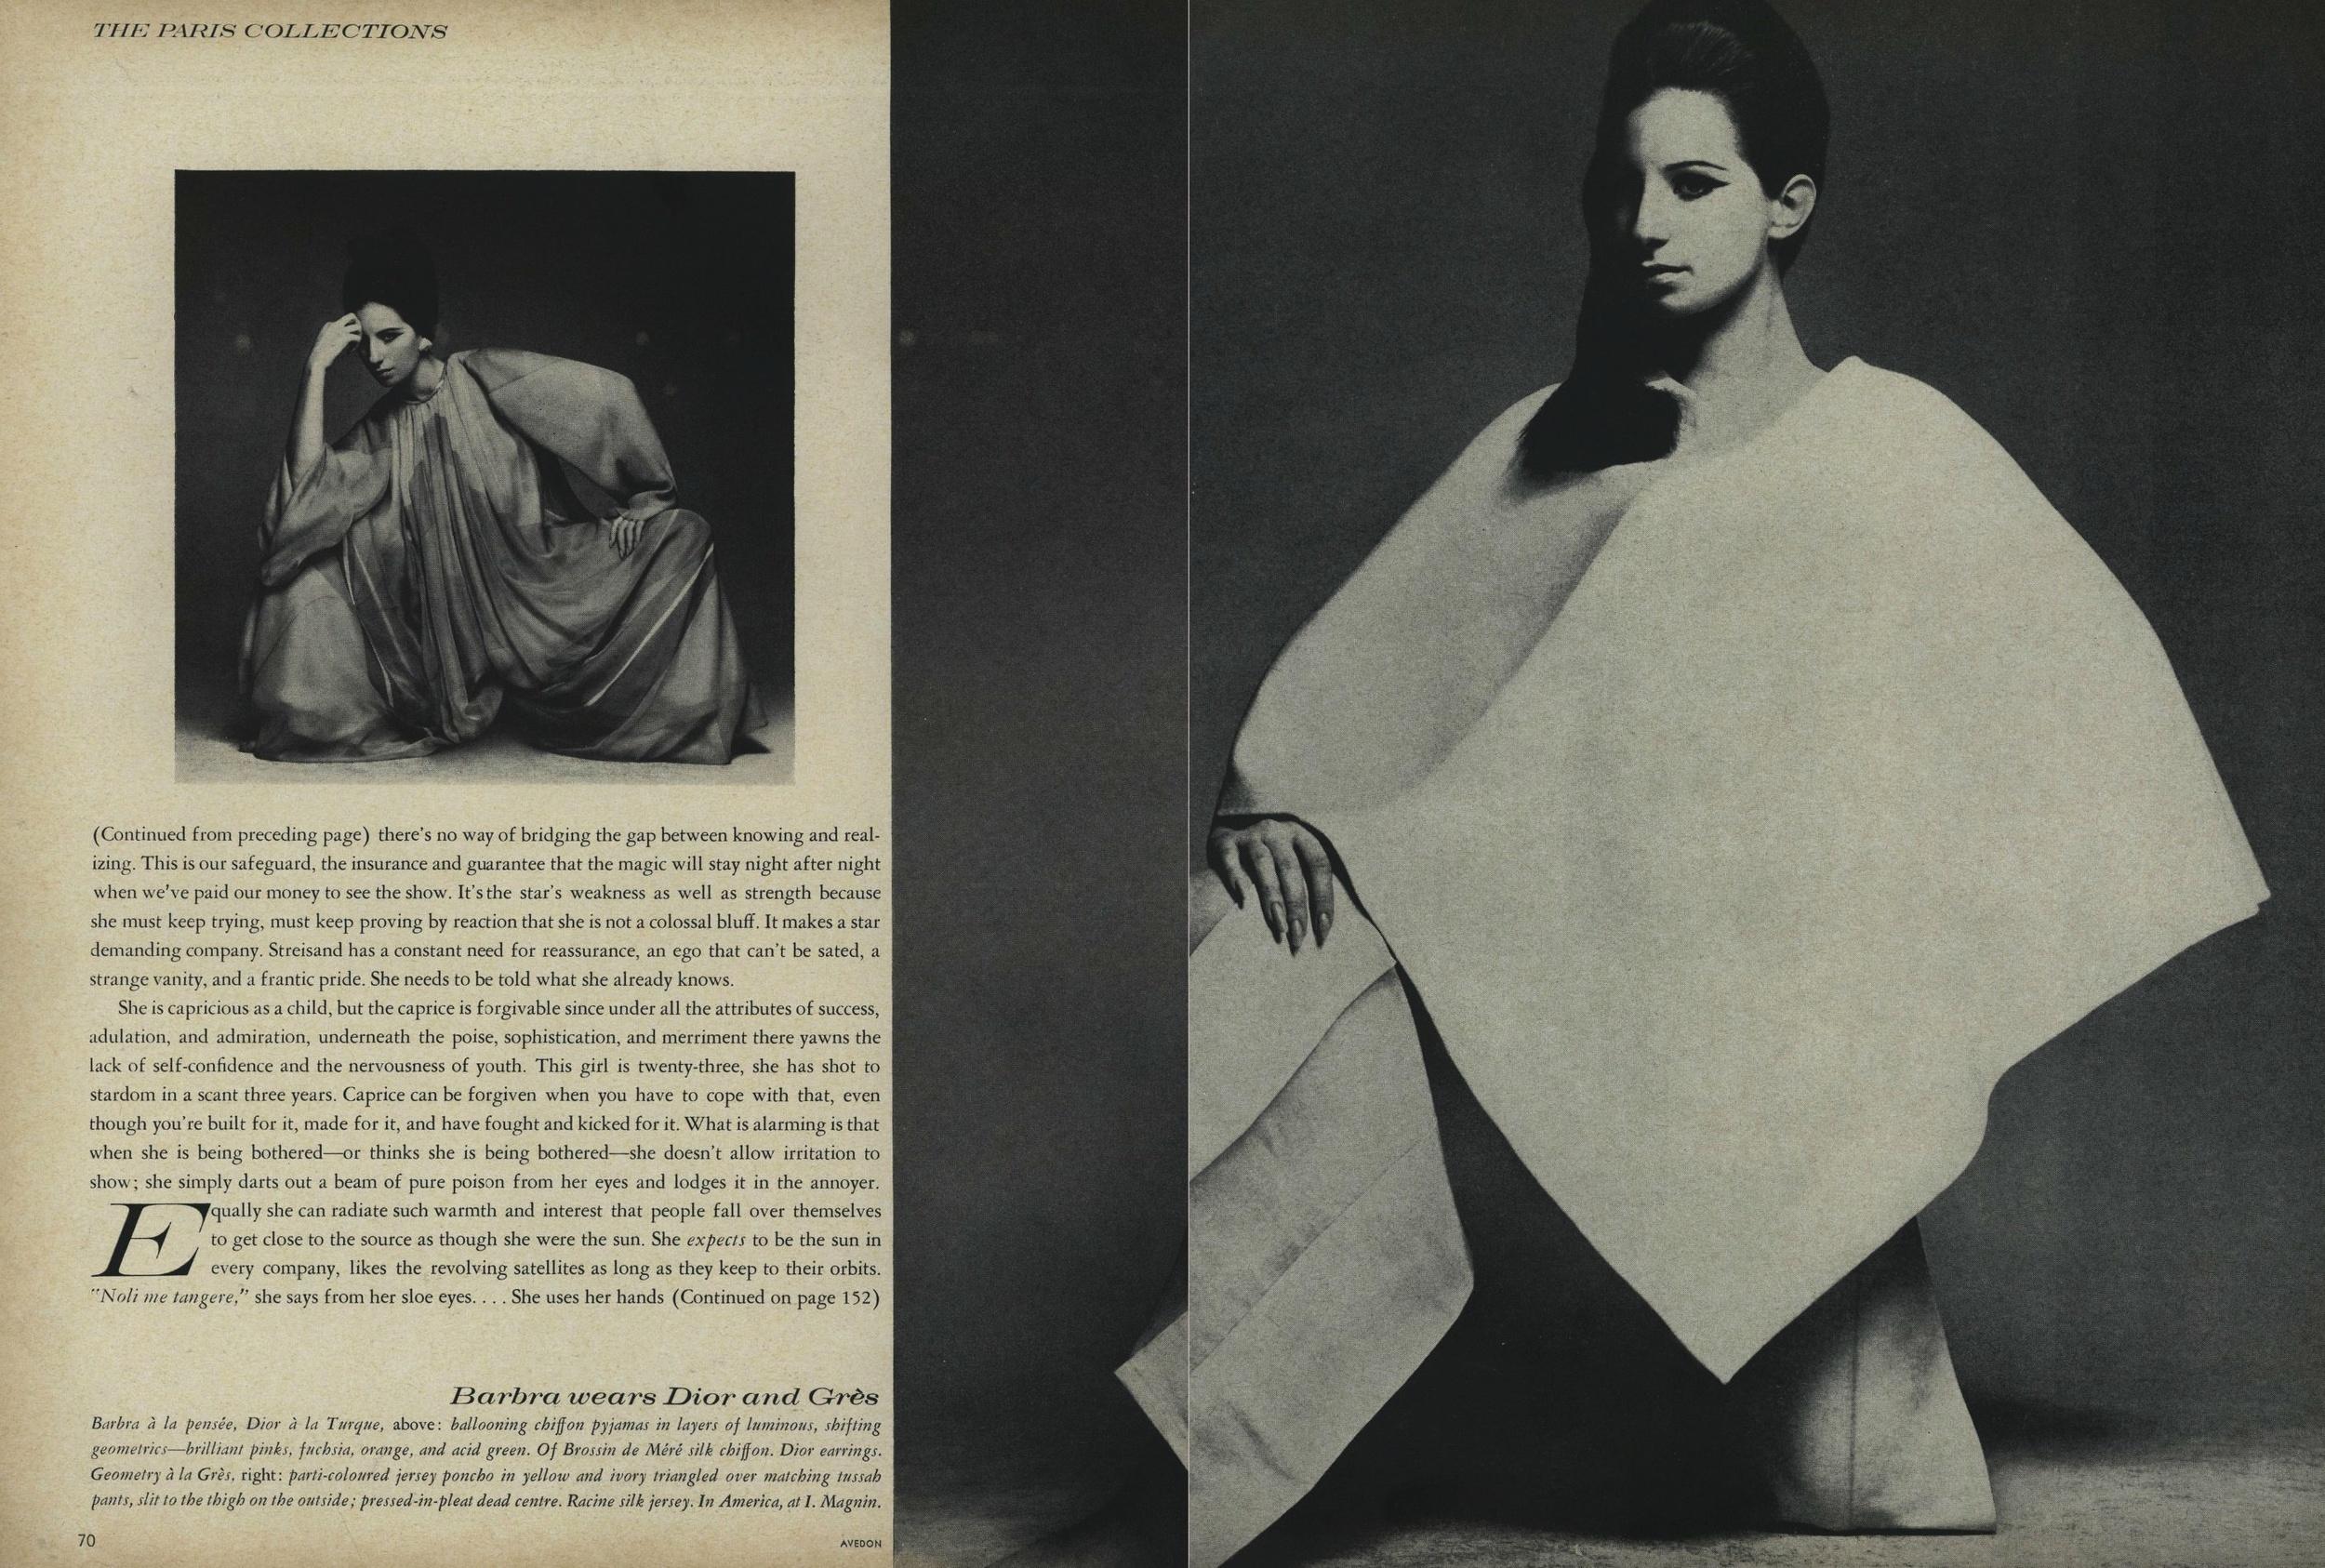 Barbra Streisand Vogue Avedon Vreeland 1966